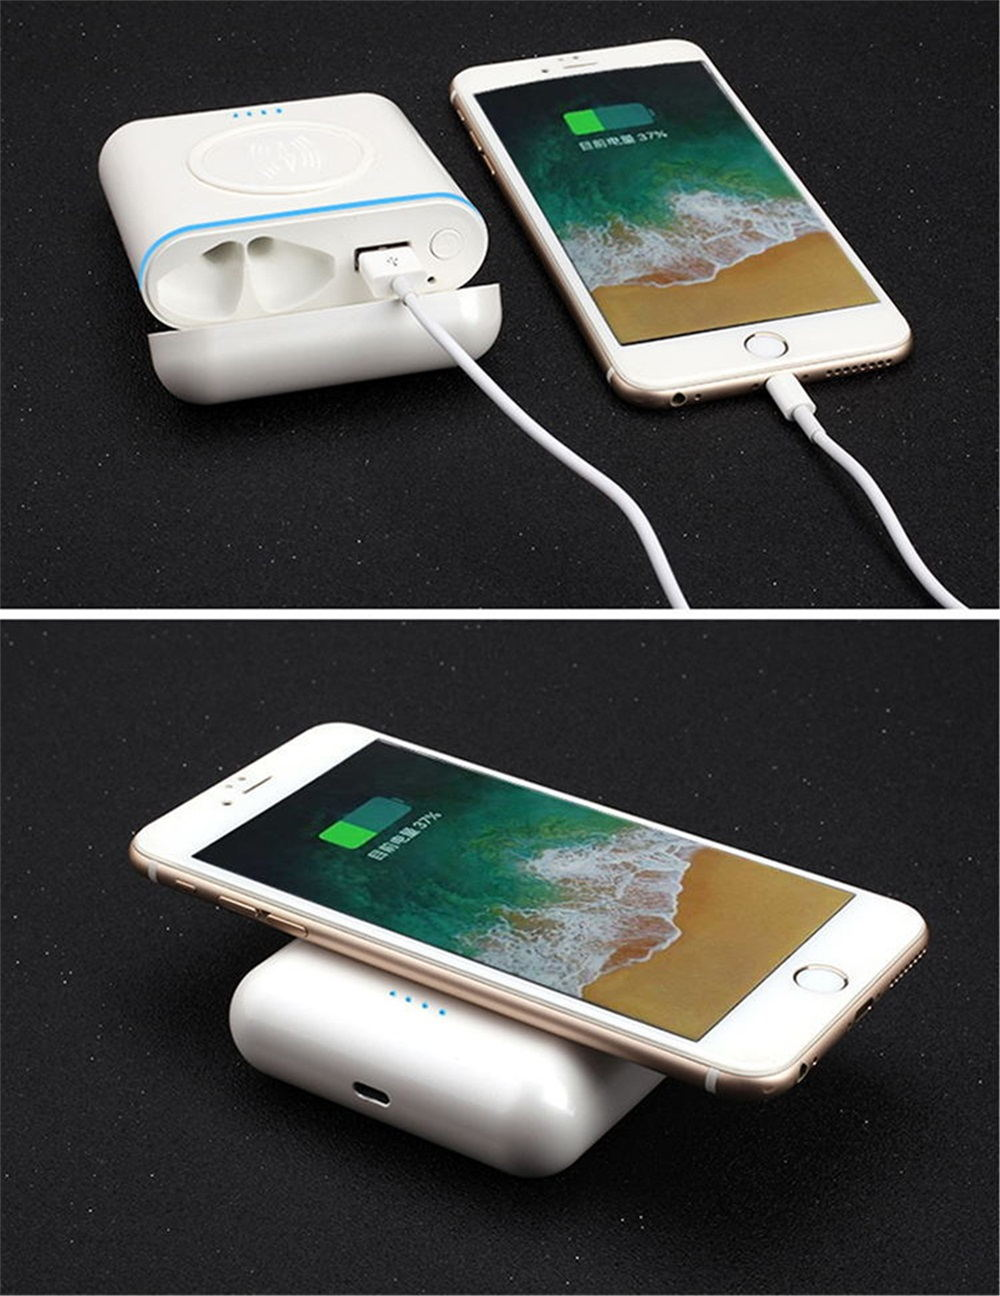 3-in-1 mobile power headphones